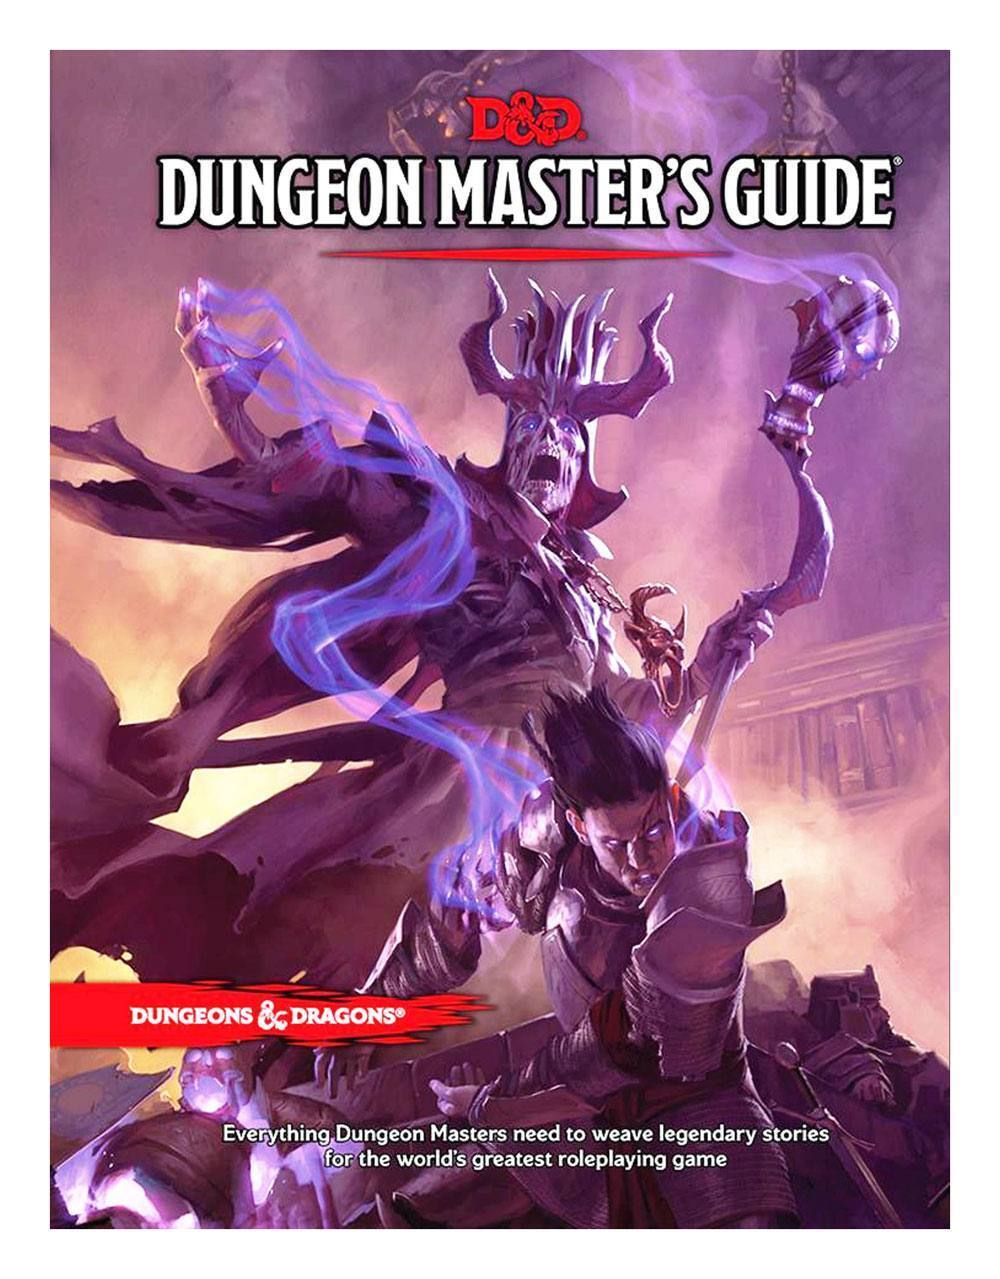 Assistants Assistants Assistants - Dungeons & Dragons Rpg Master Guide - Neuf   Emballé Version ebecd9